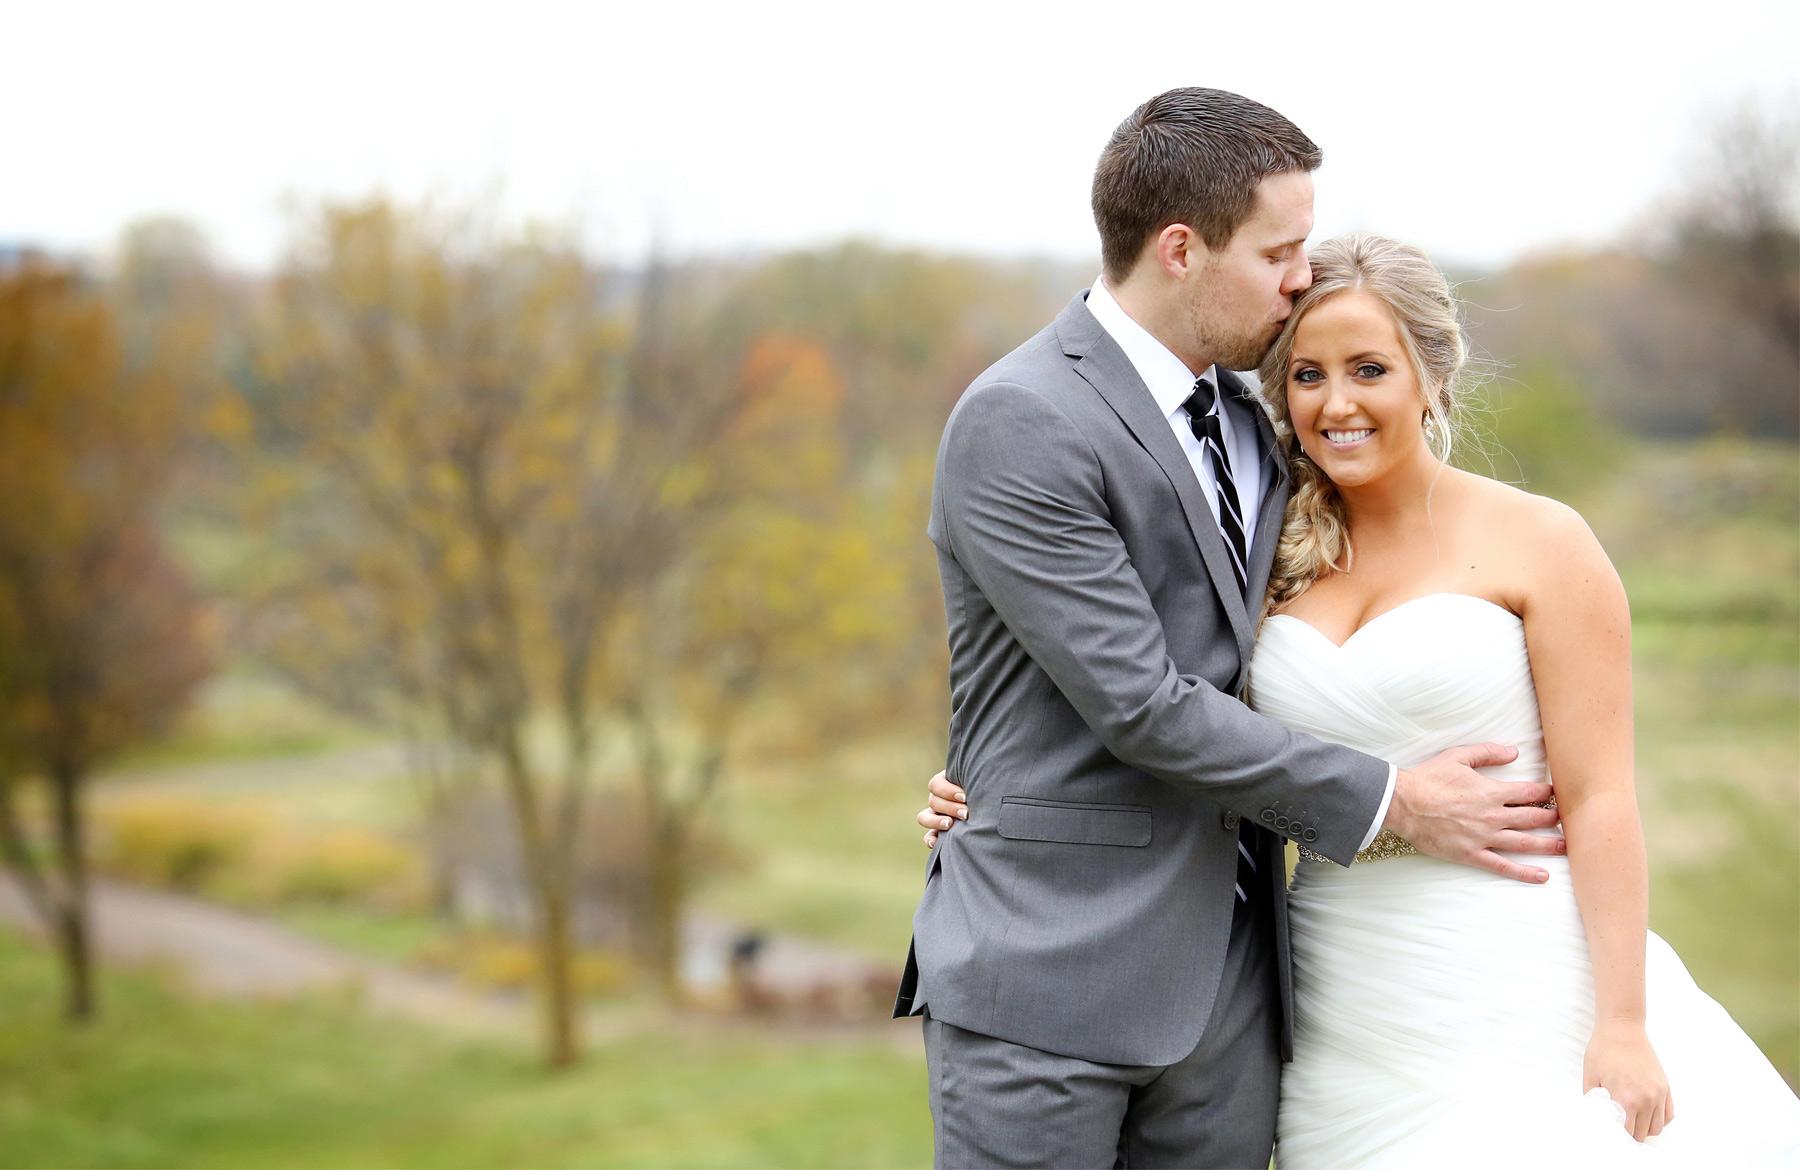 07-Stillwater-Minnesota-Wedding-Photographer-by-Andrew-Vick-Photography-Fall-Autumn-StoneRidge-Golf-Club-First-Meeting-Look-Bride-Groom-Hug-Embrace-Kiss-Hills-Field-Micaela-and-Derek.jpg